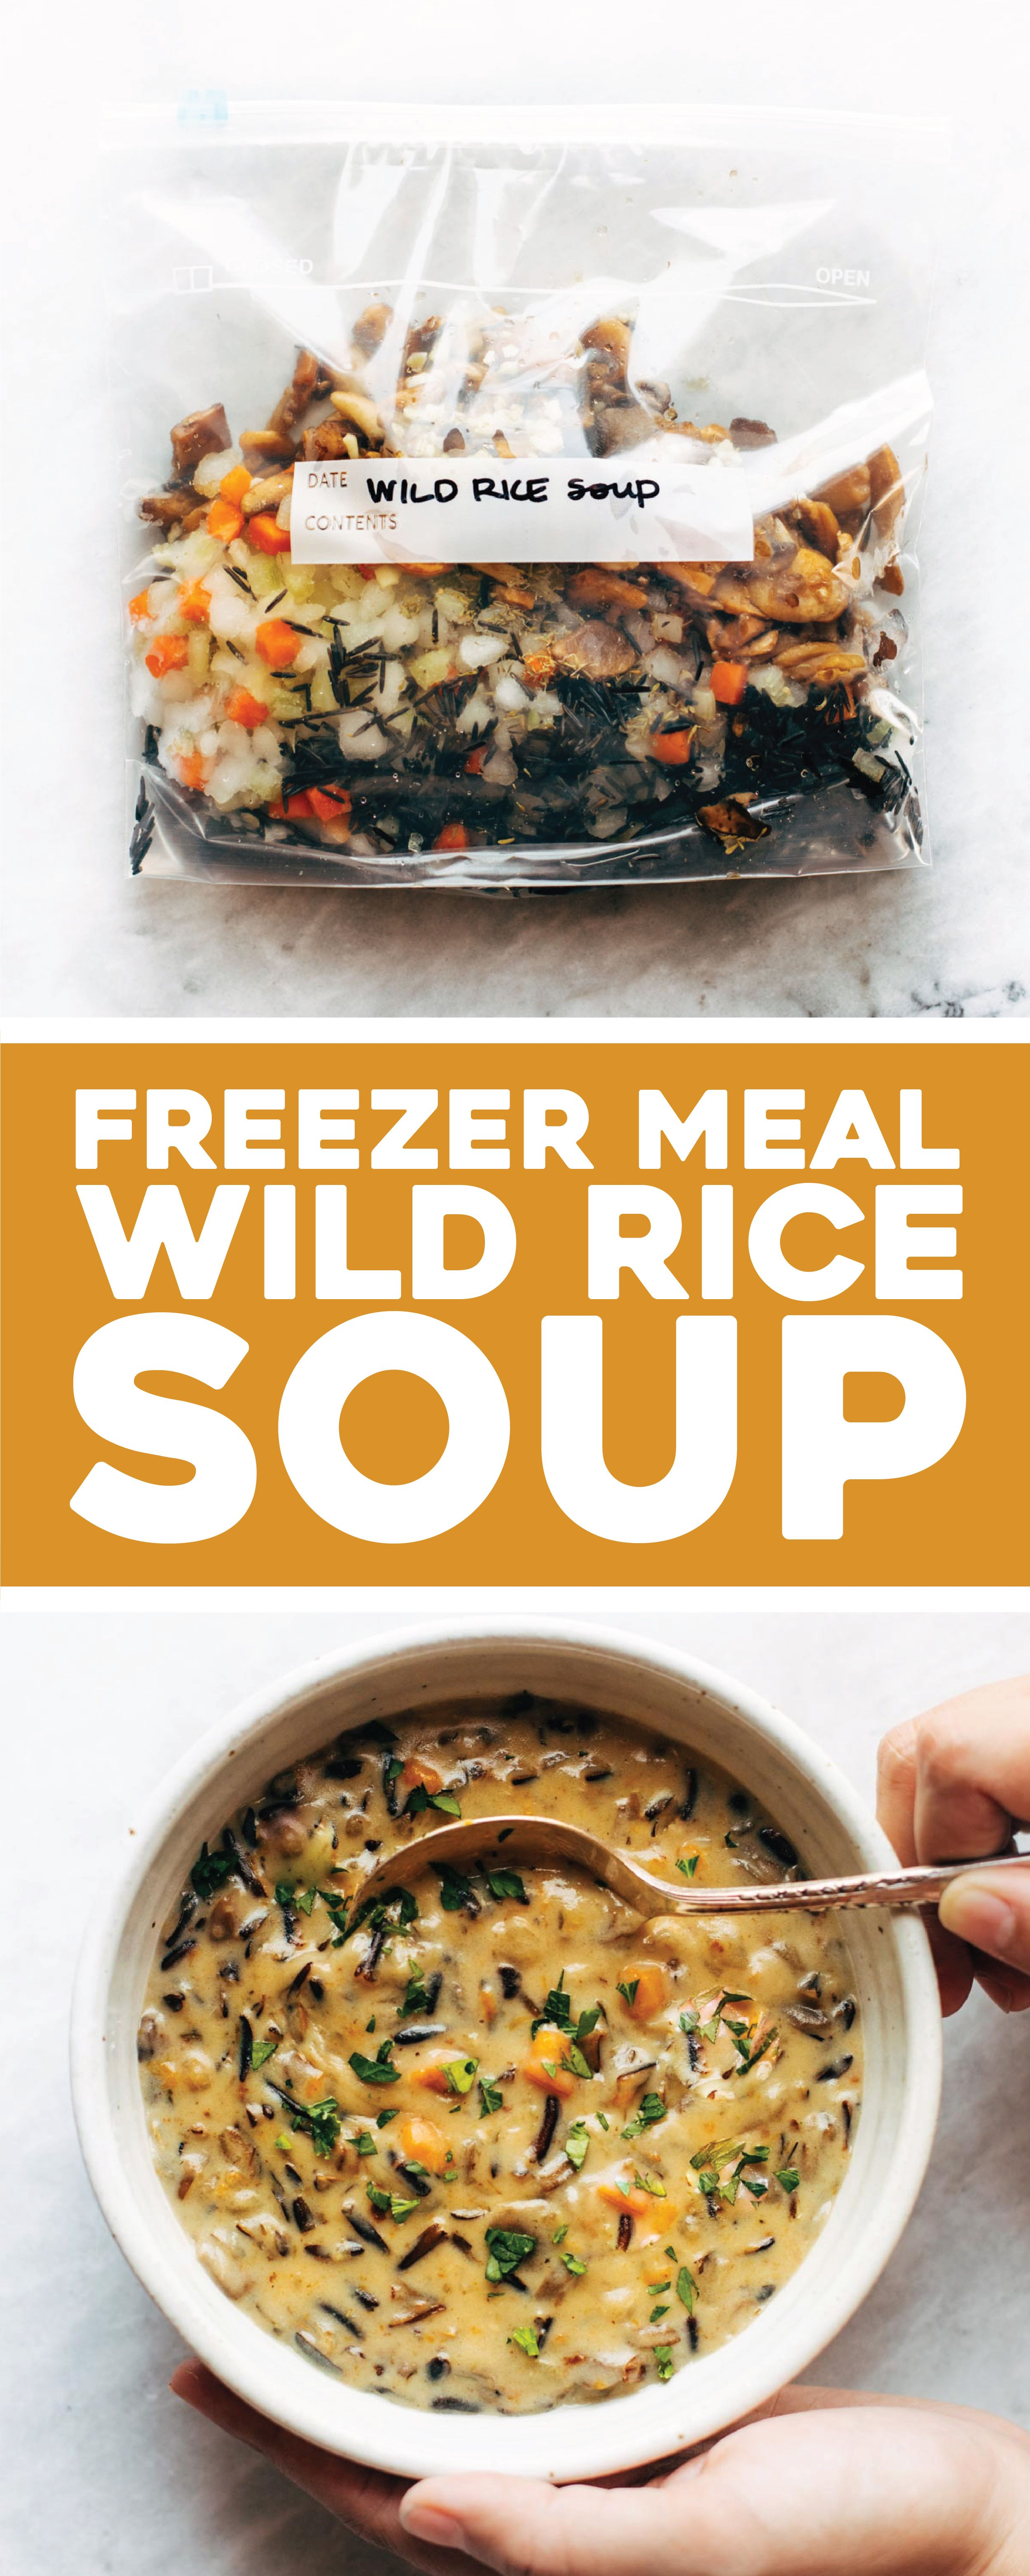 Freezer Meal Wild Rice Soup #crockpotmealprep